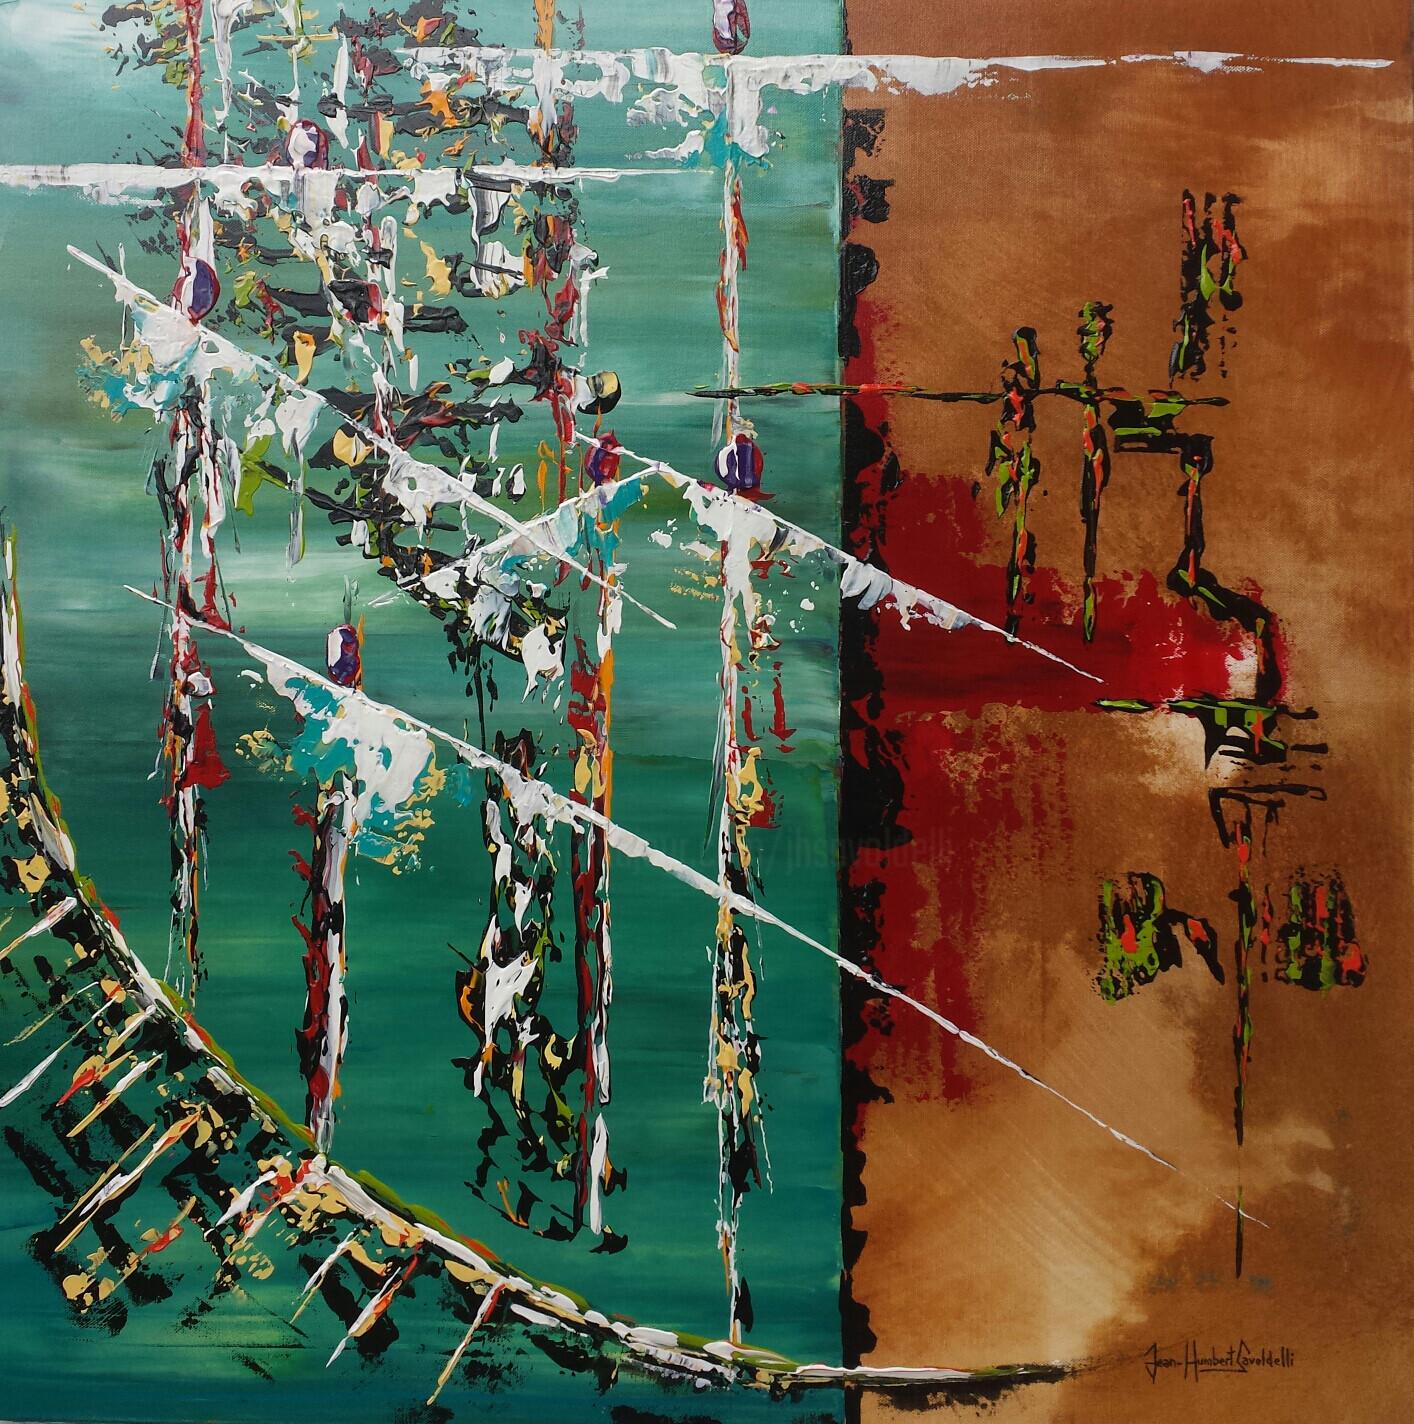 JEAN-HUMBERT SAVOLDELLI - cotonou